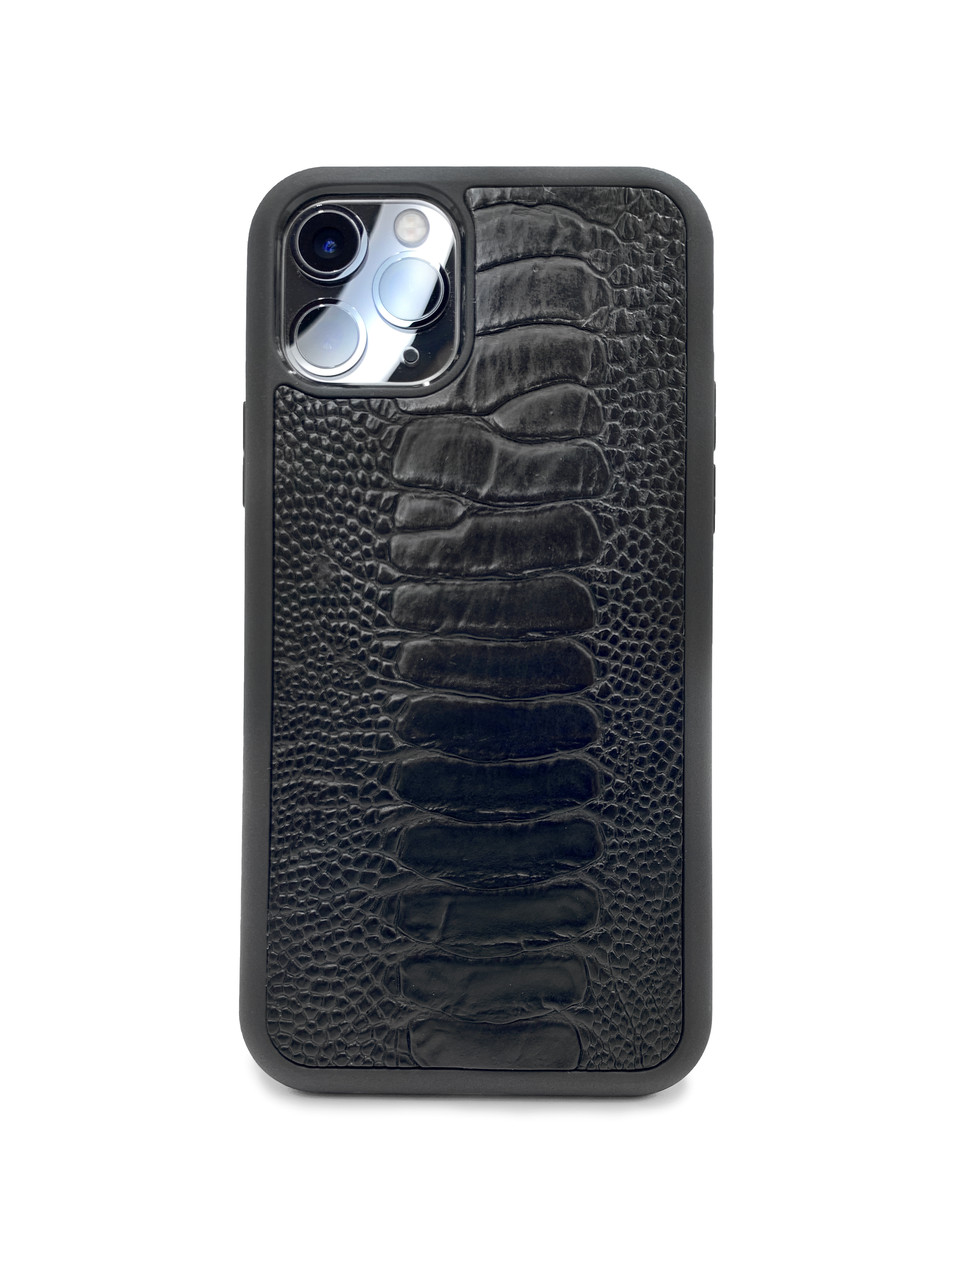 Чехол для iPhone 11 Pro чёрного цвета из кожи Страуса